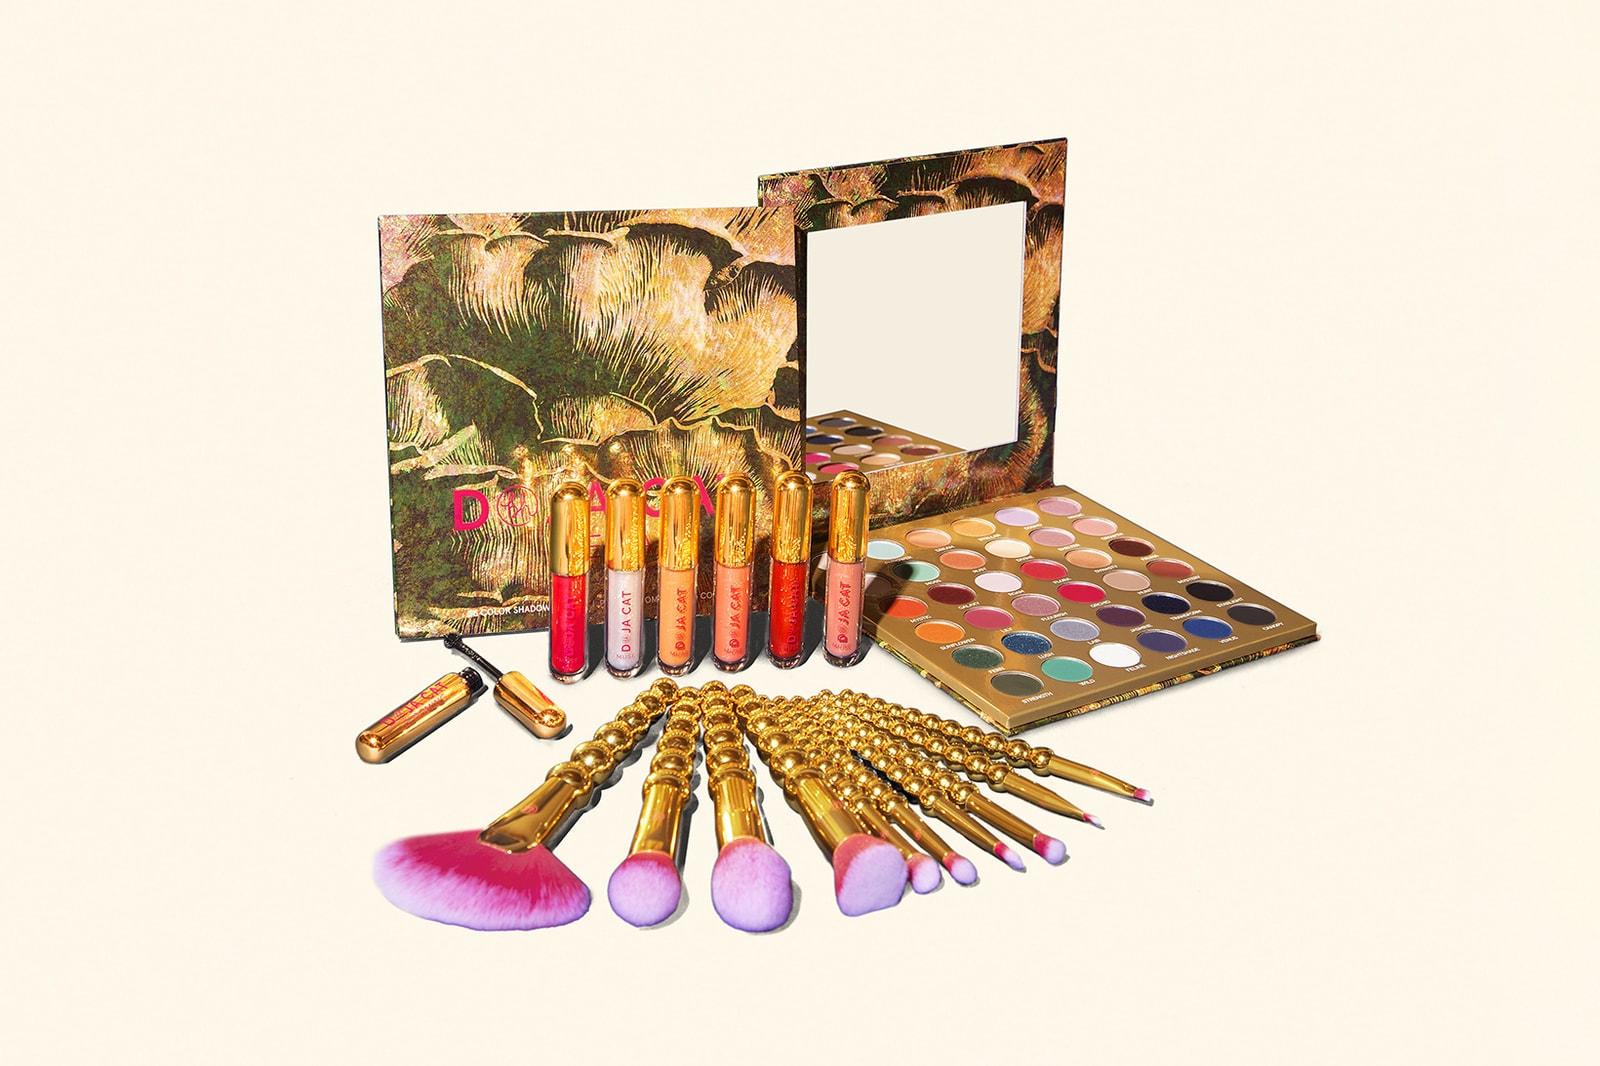 Doja Cat BH Cosmetics Makeup Collection Collaboration Eyeshadow Palette Blush Highlighter Lip Gloss Balm Brushes Mirror Eyeliner Mascara